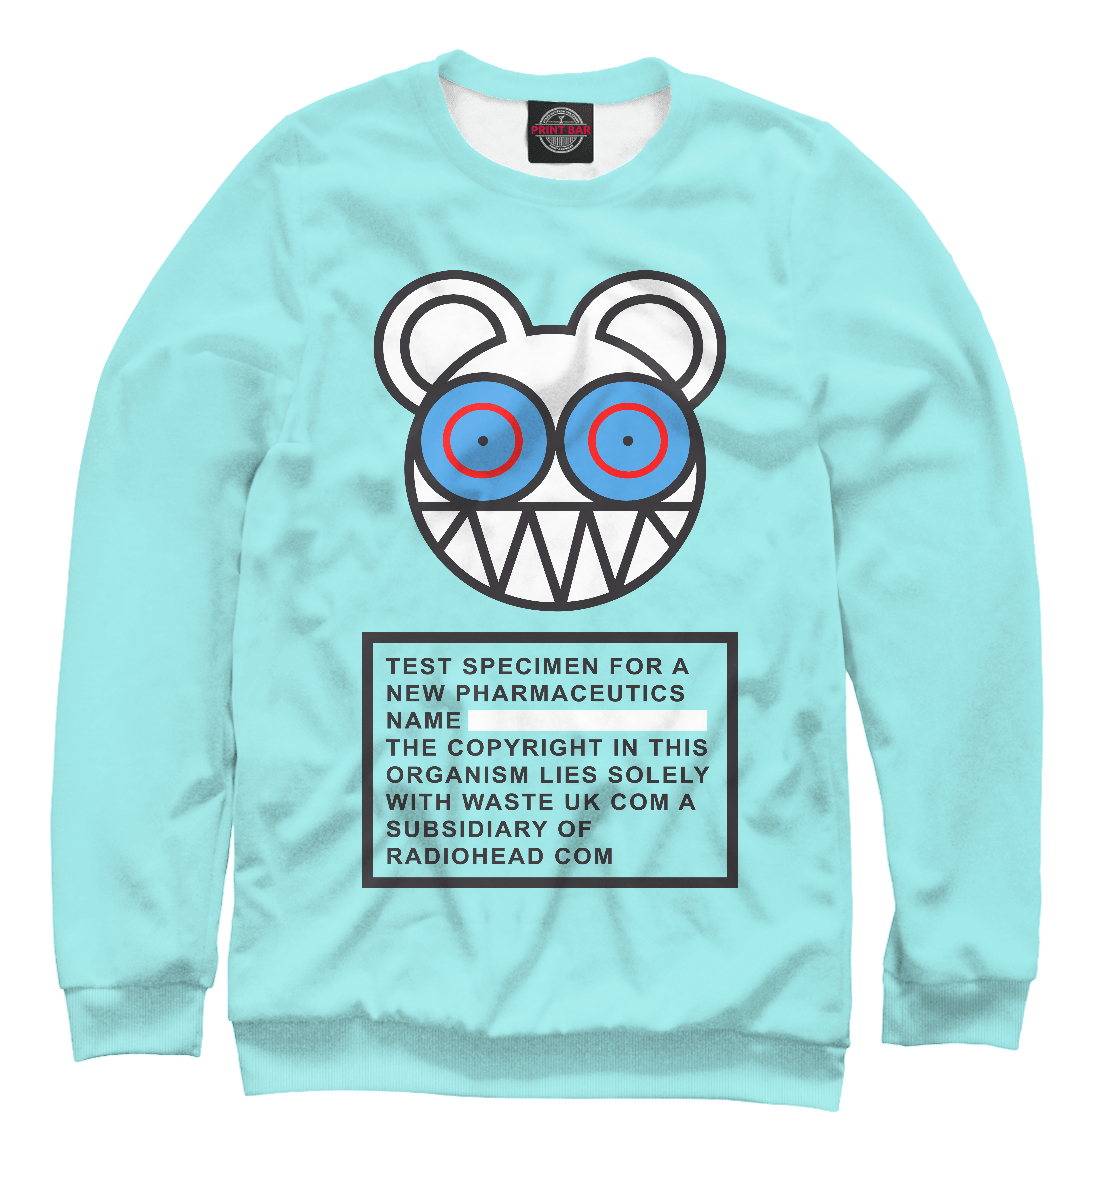 Купить Radiohead, Printbar, Свитшоты, RDH-774399-swi-2